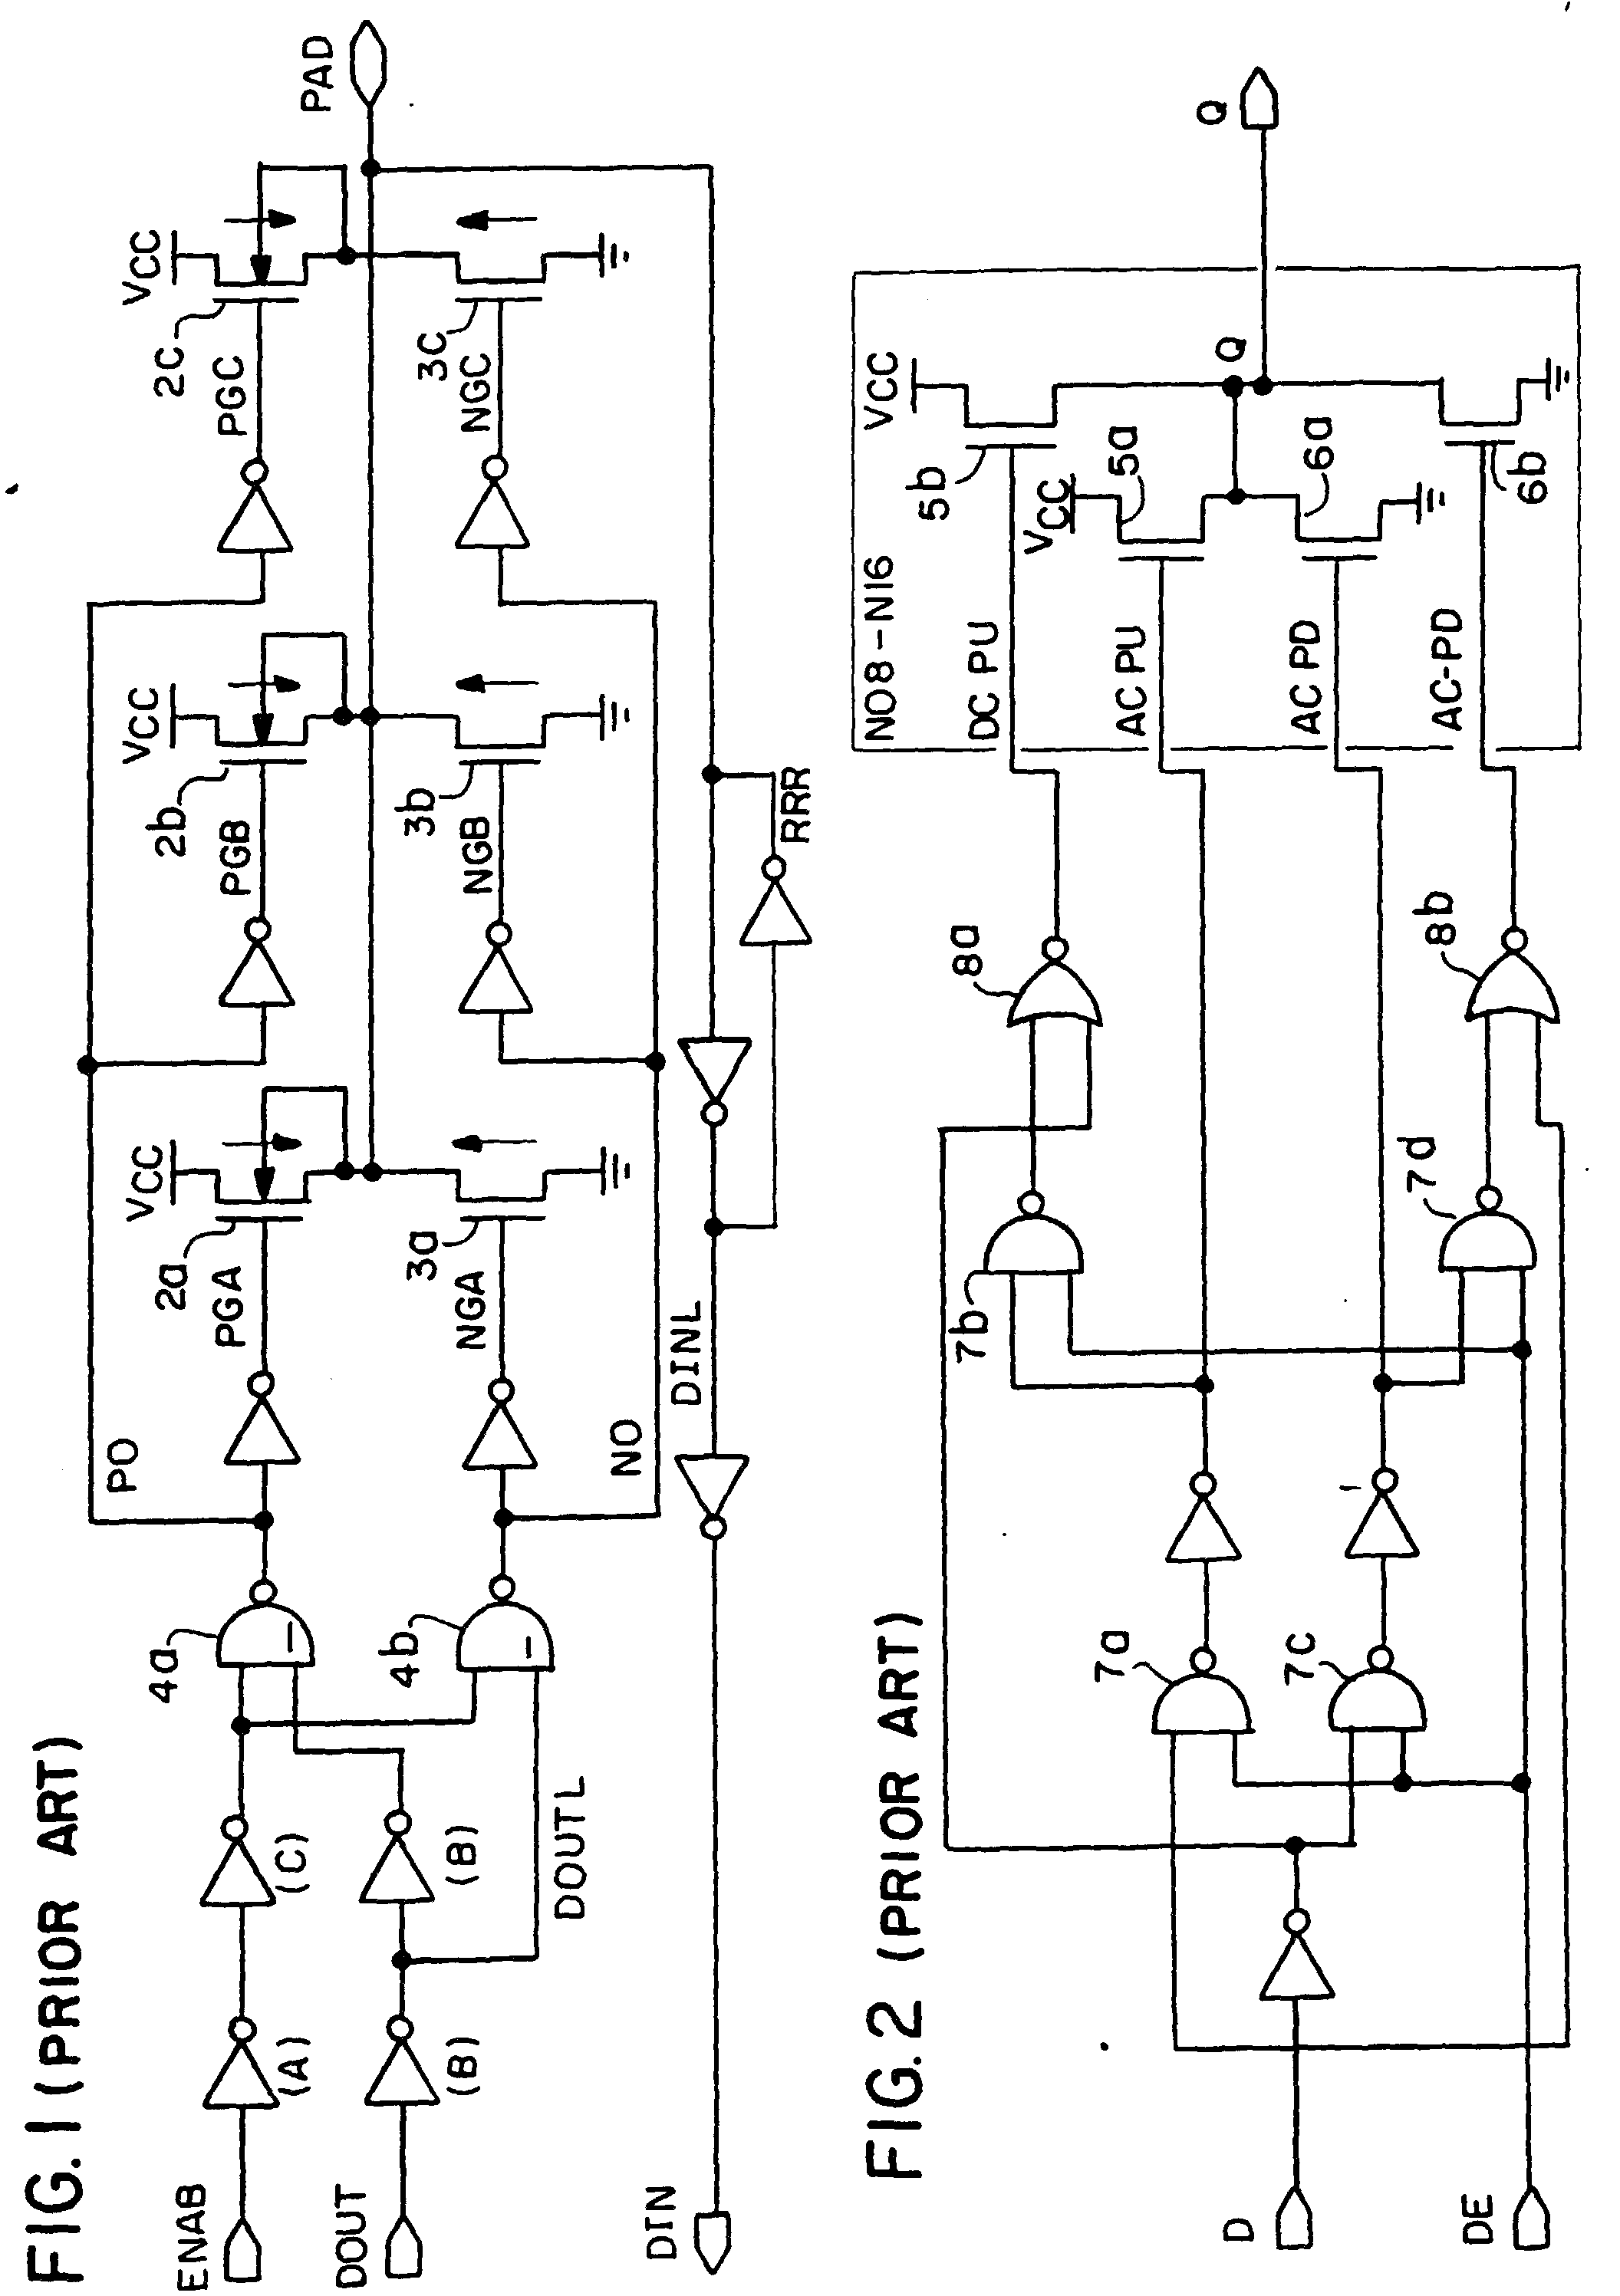 patent ep0502597b1 - cmos output buffer circuit